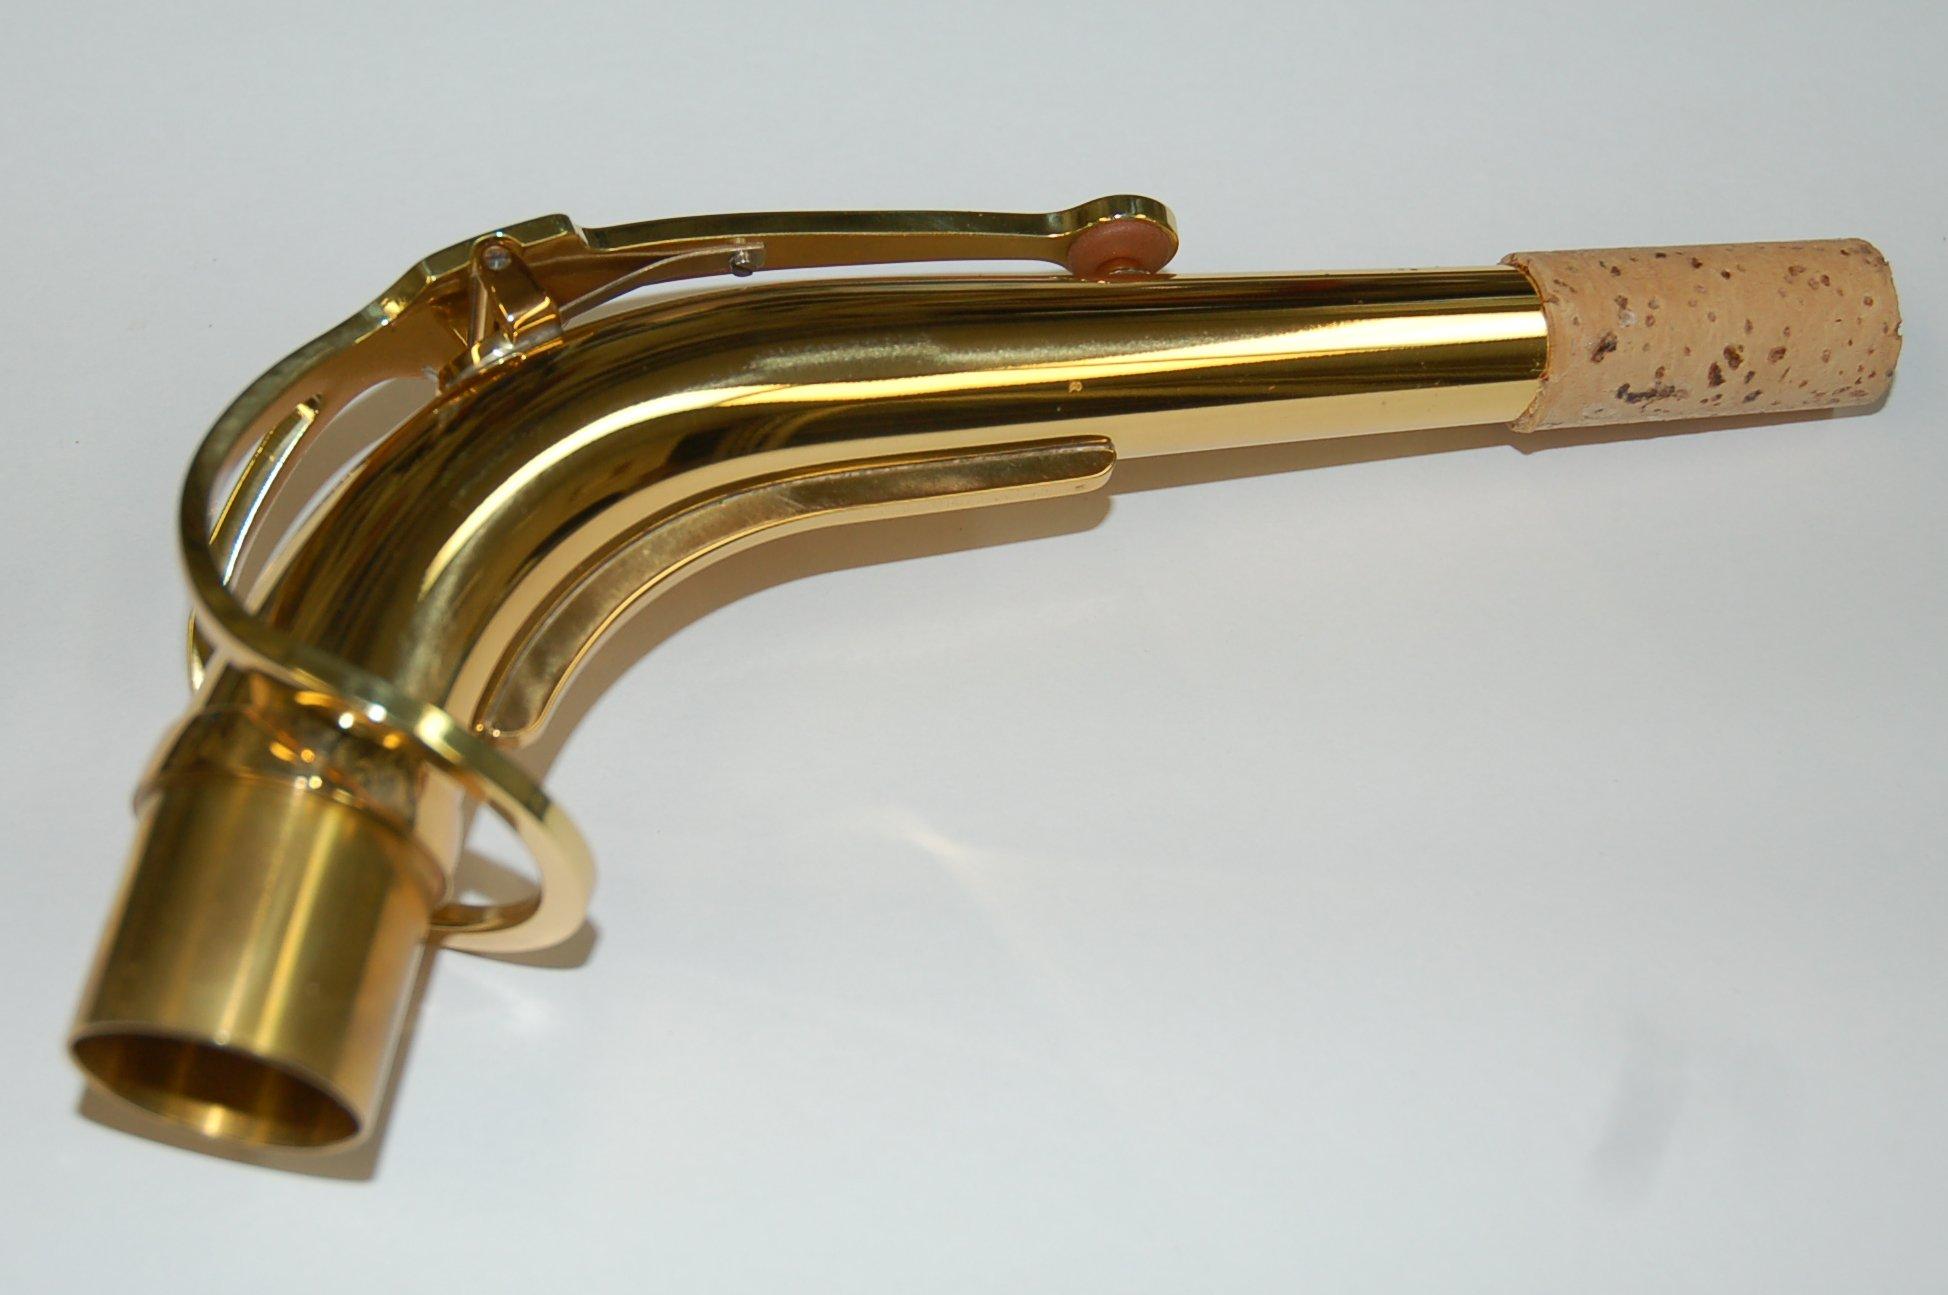 Jupiter Alto Saxophone Neck Sax Gooseneck Mouthpipe JAS-567 JASN-567GL